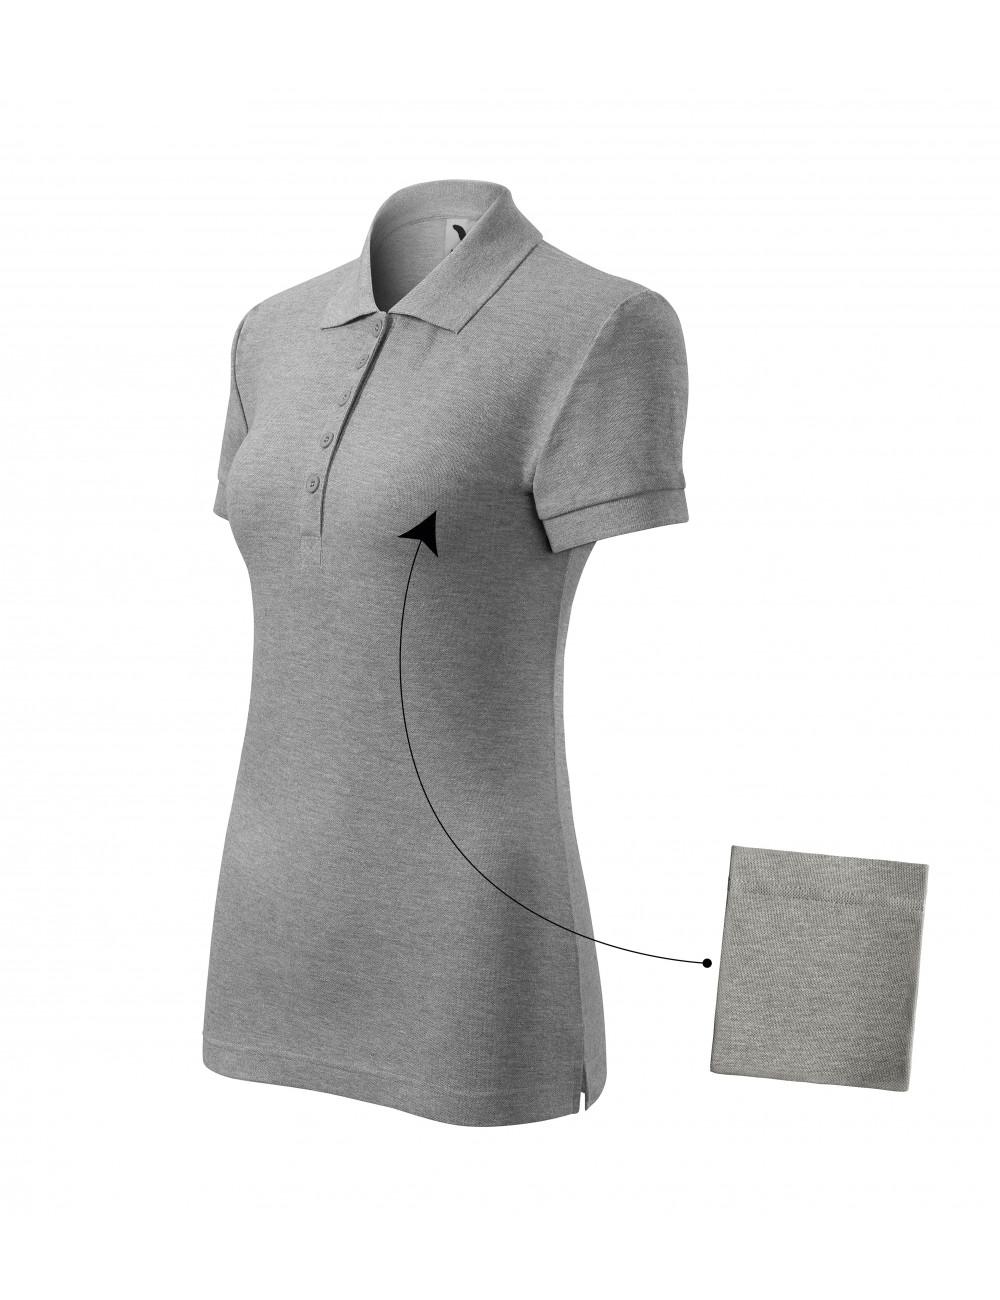 Adler MALFINI Koszulka polo damska Cotton 213 ciemnoszary melanż